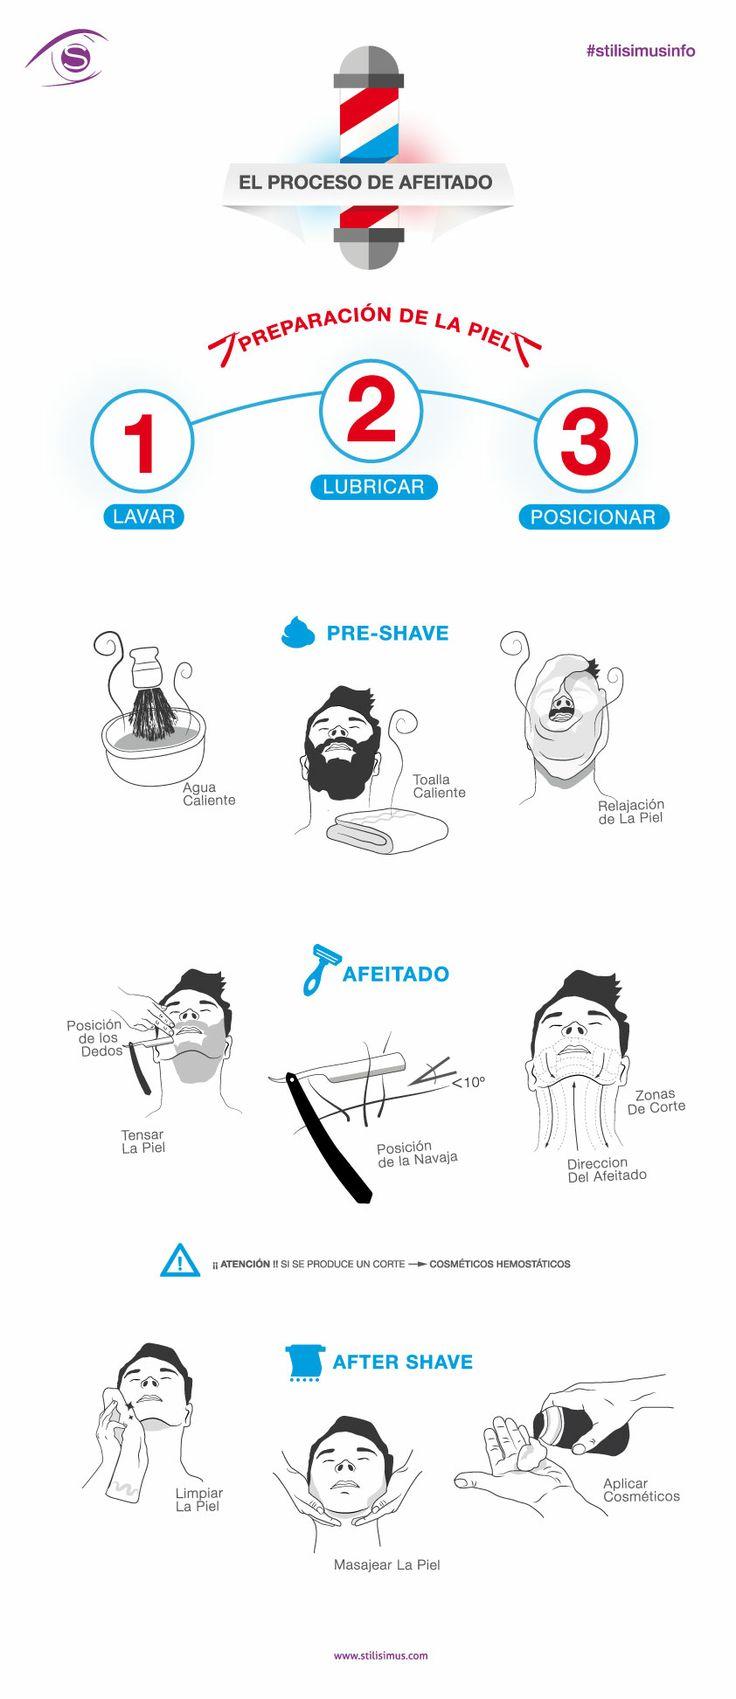 Proceso de afeitado a navaja. Pasos importantes a recordar en un protocolo básico #stilisimusinfo